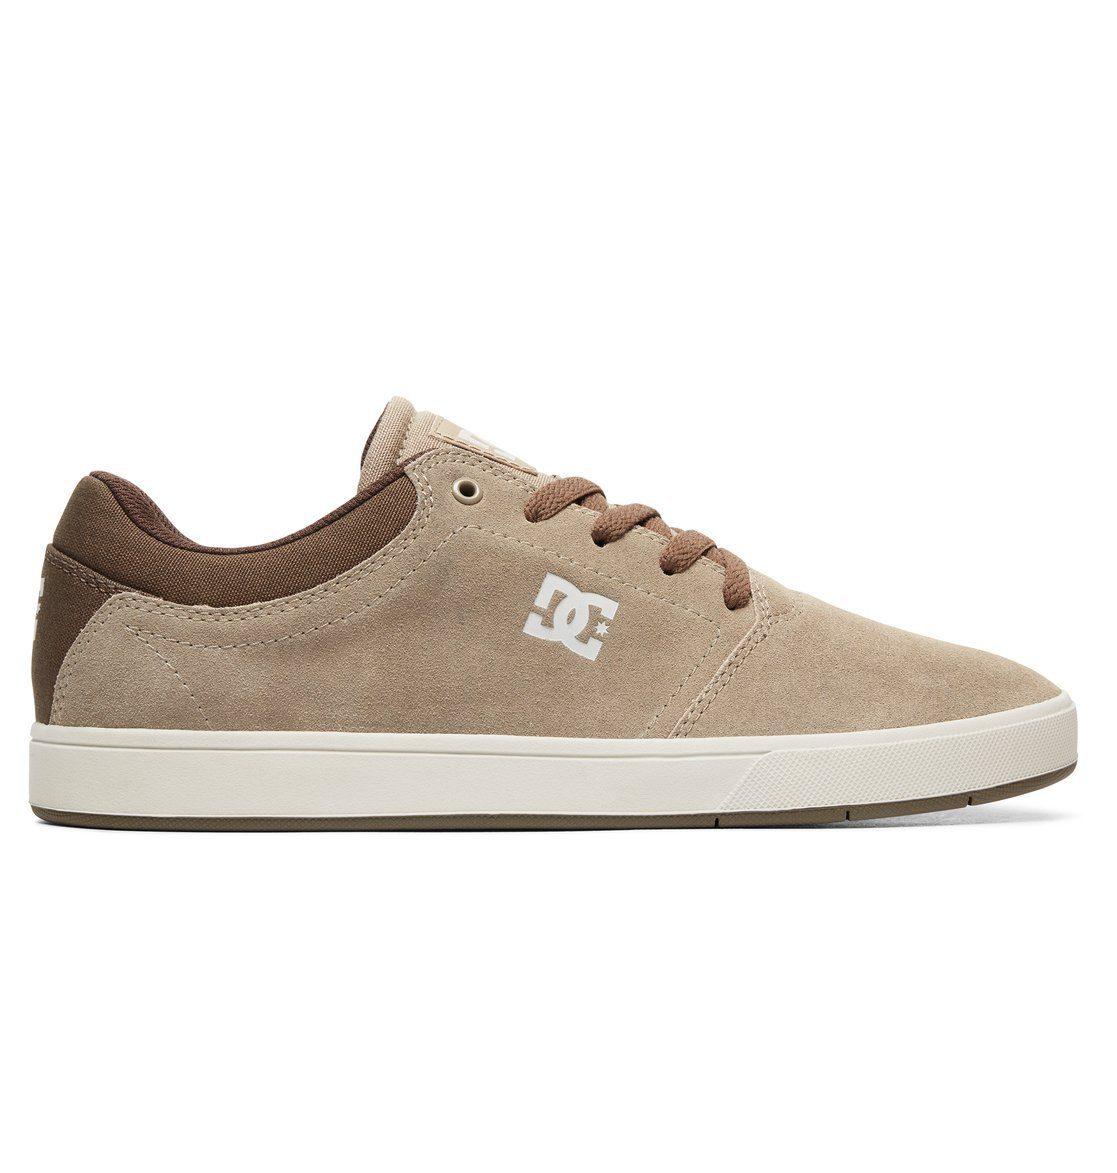 DC Shoes Schuhe Crisis online kaufen  Brown#ft5_slash#brown#ft5_slash#brown